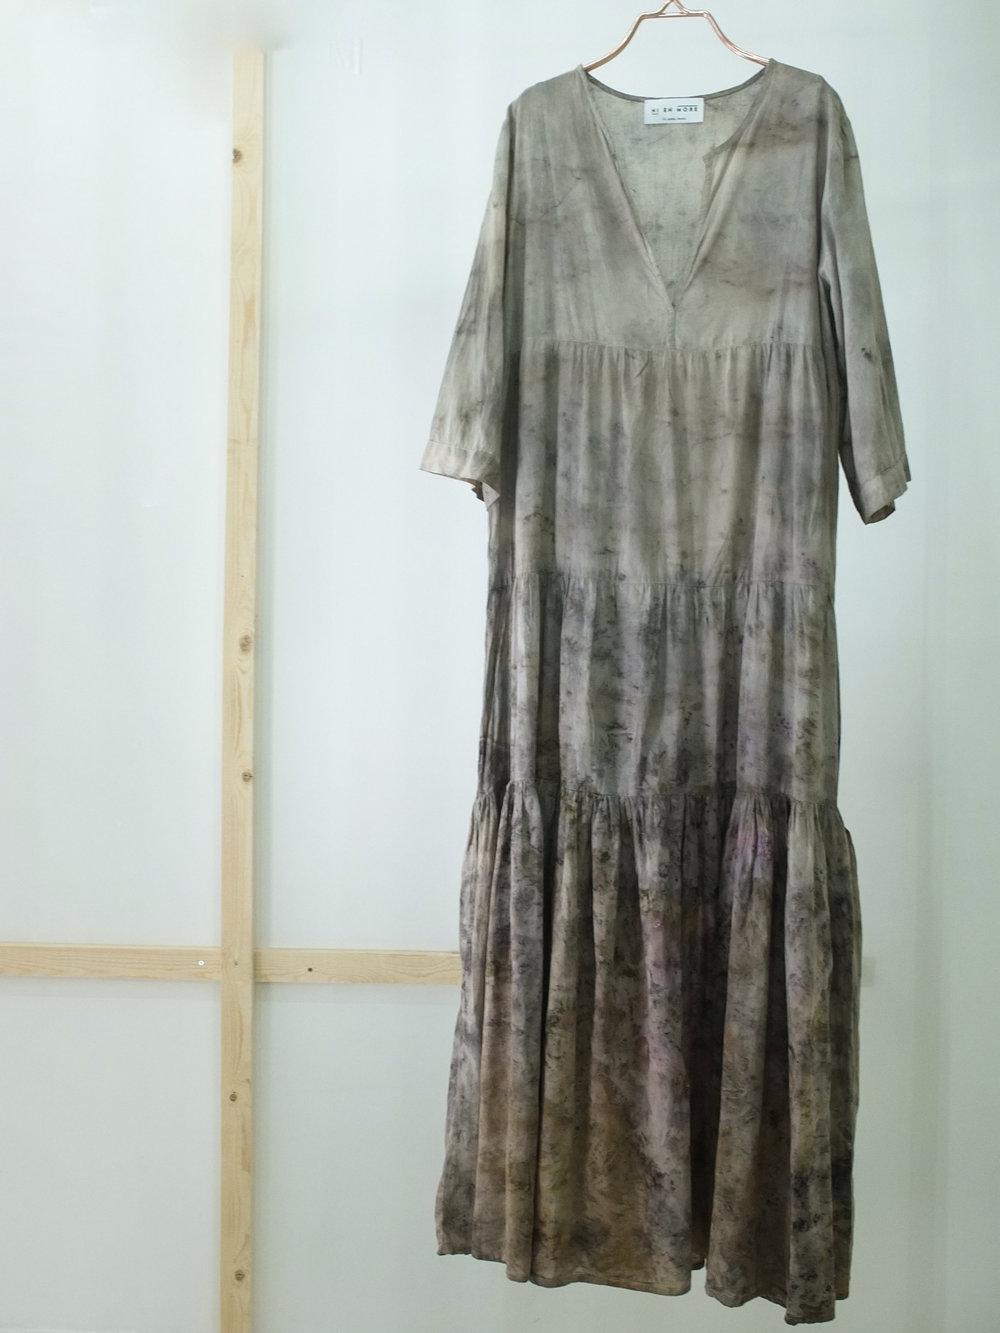 COTTON DRESS — NO. 9 OF 60 — SIZE L